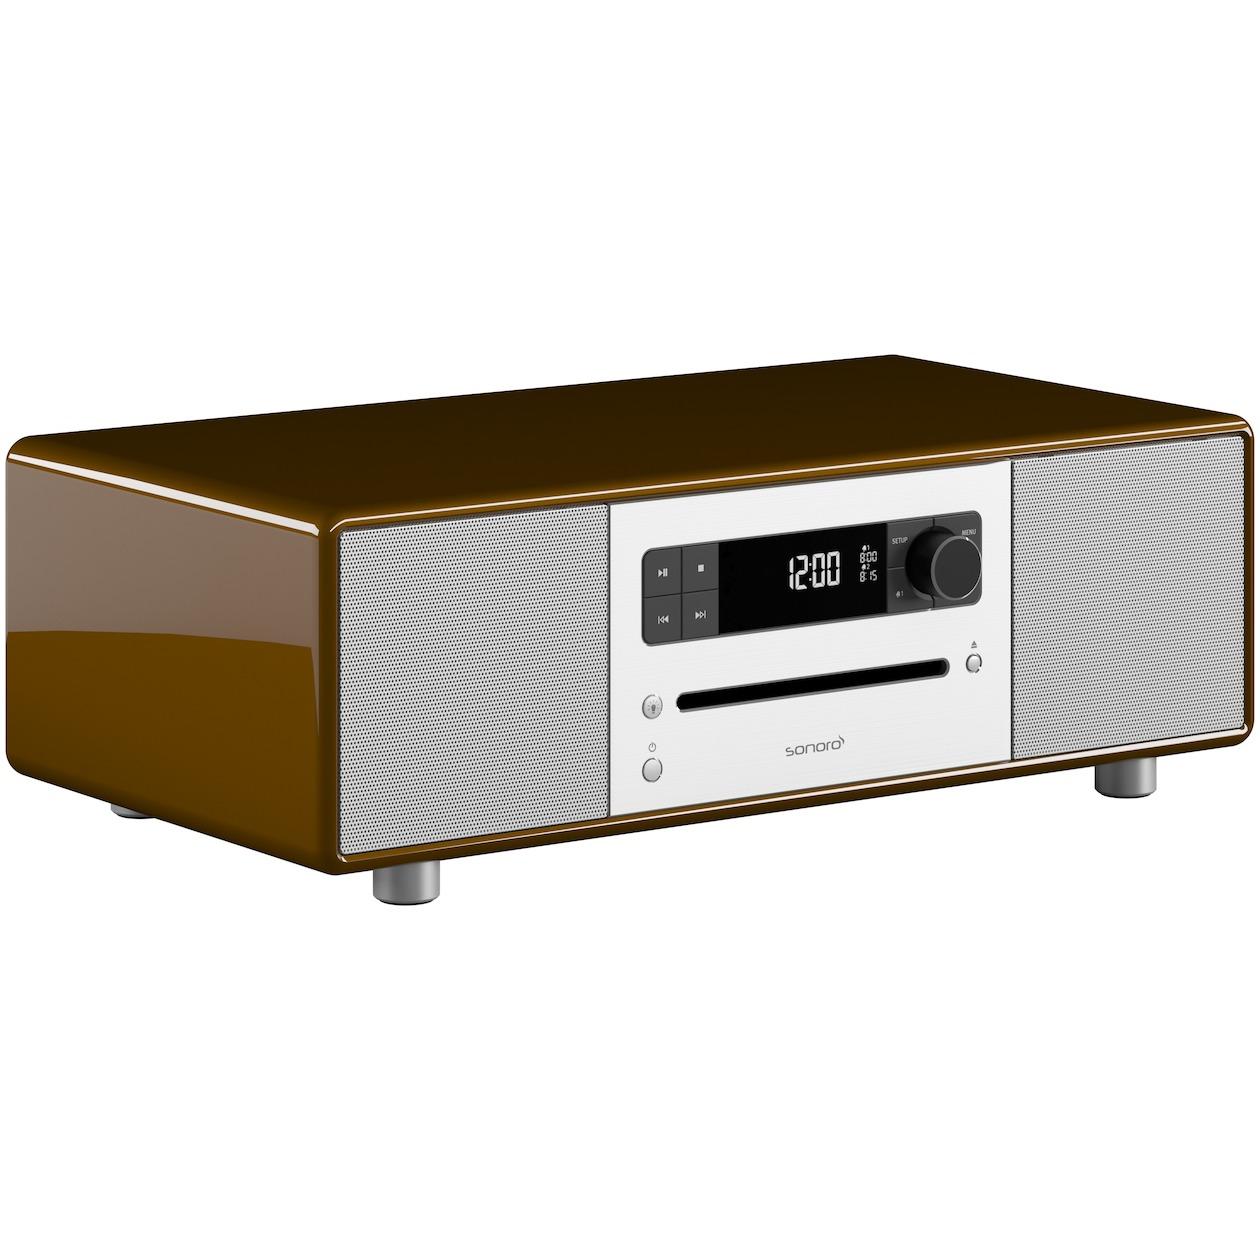 Sonoro stereo set Stereo 320 havanna